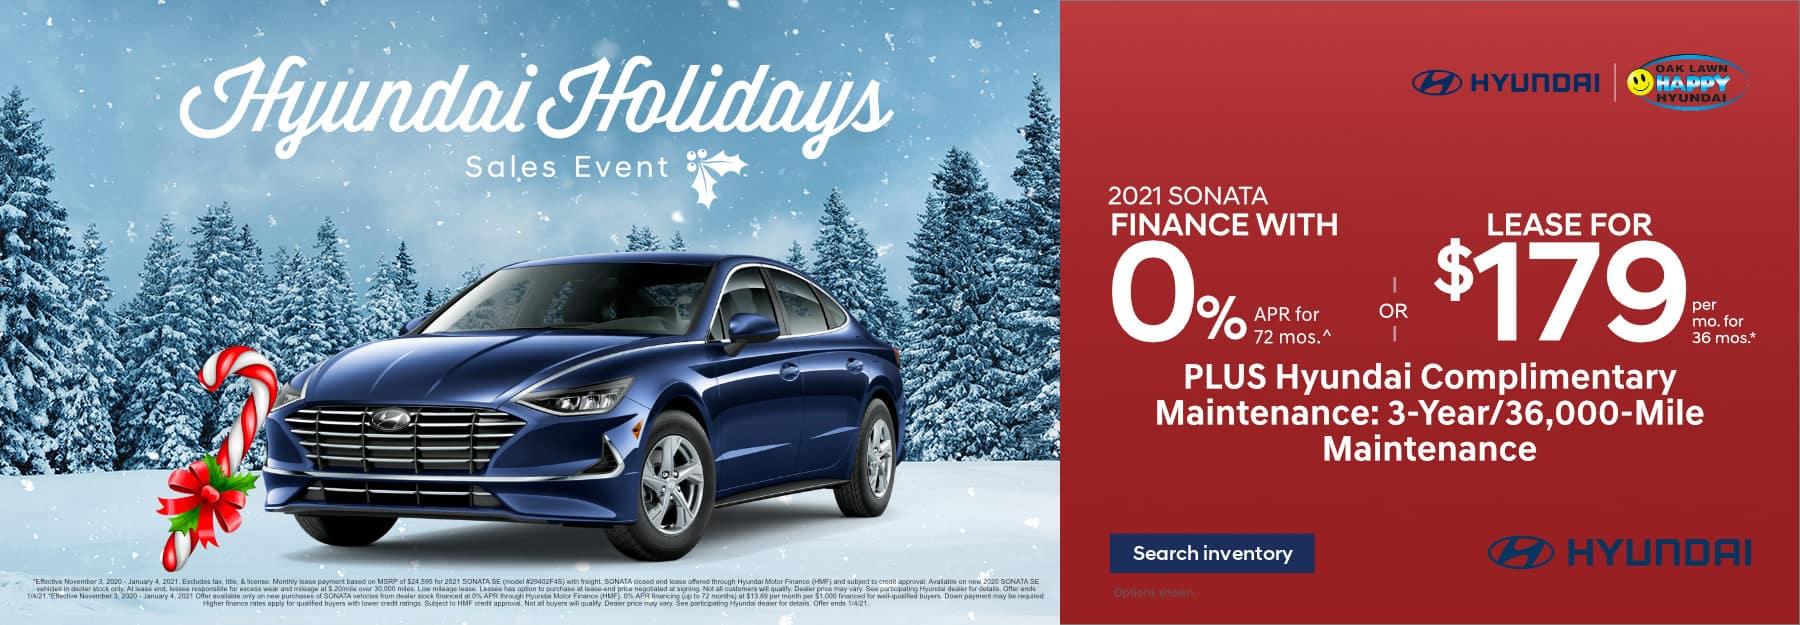 December-2020_2021_Sonata_Happy_Hyundai